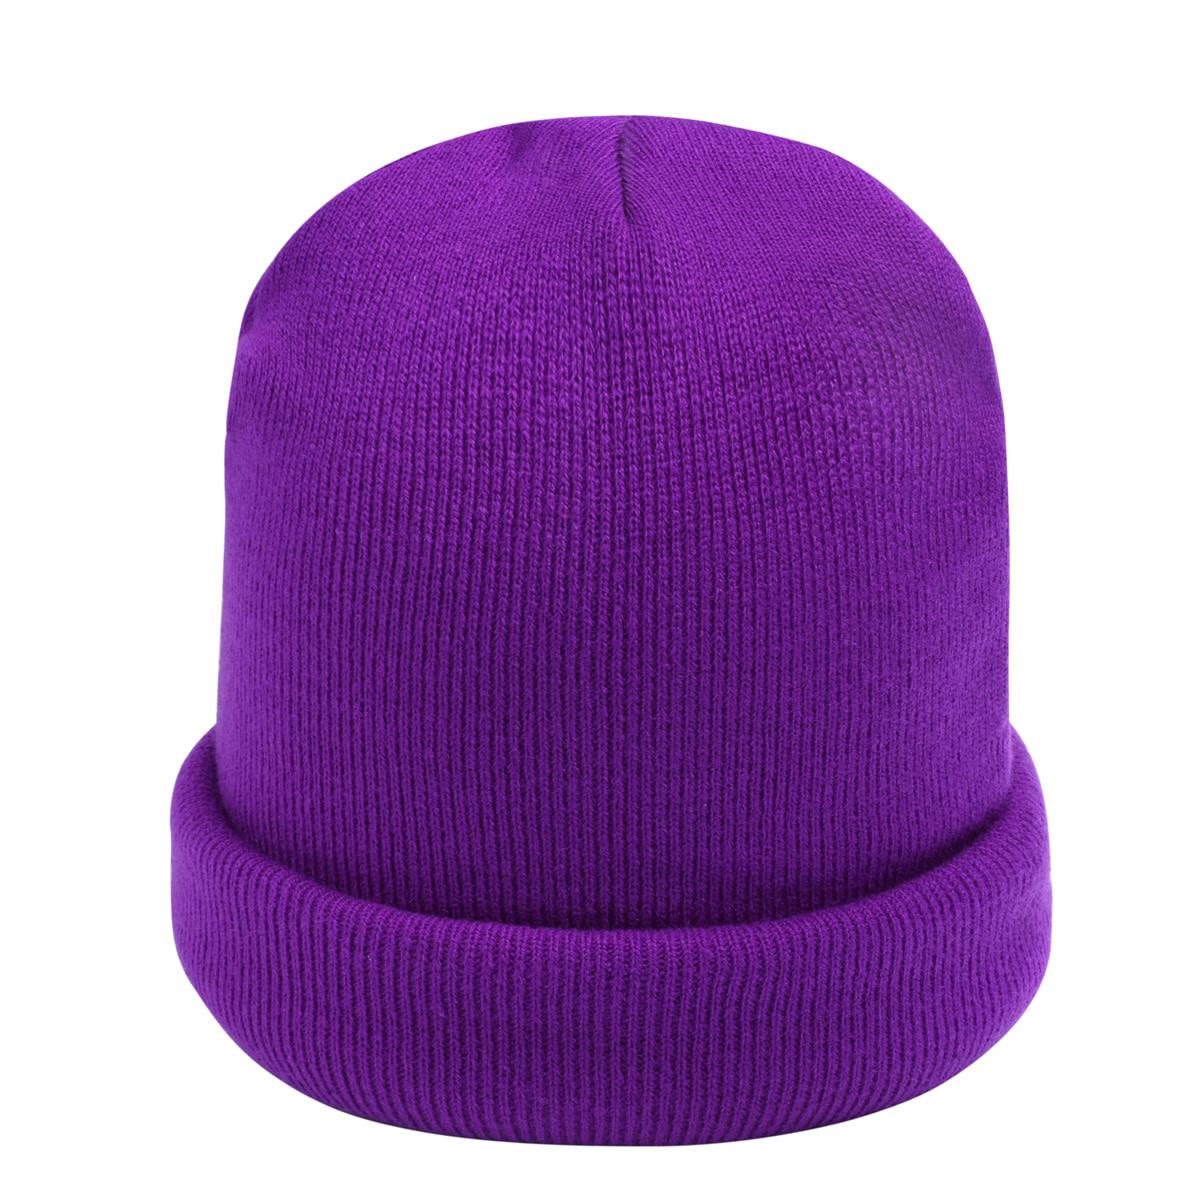 With love Beanie rainbow colors - purple